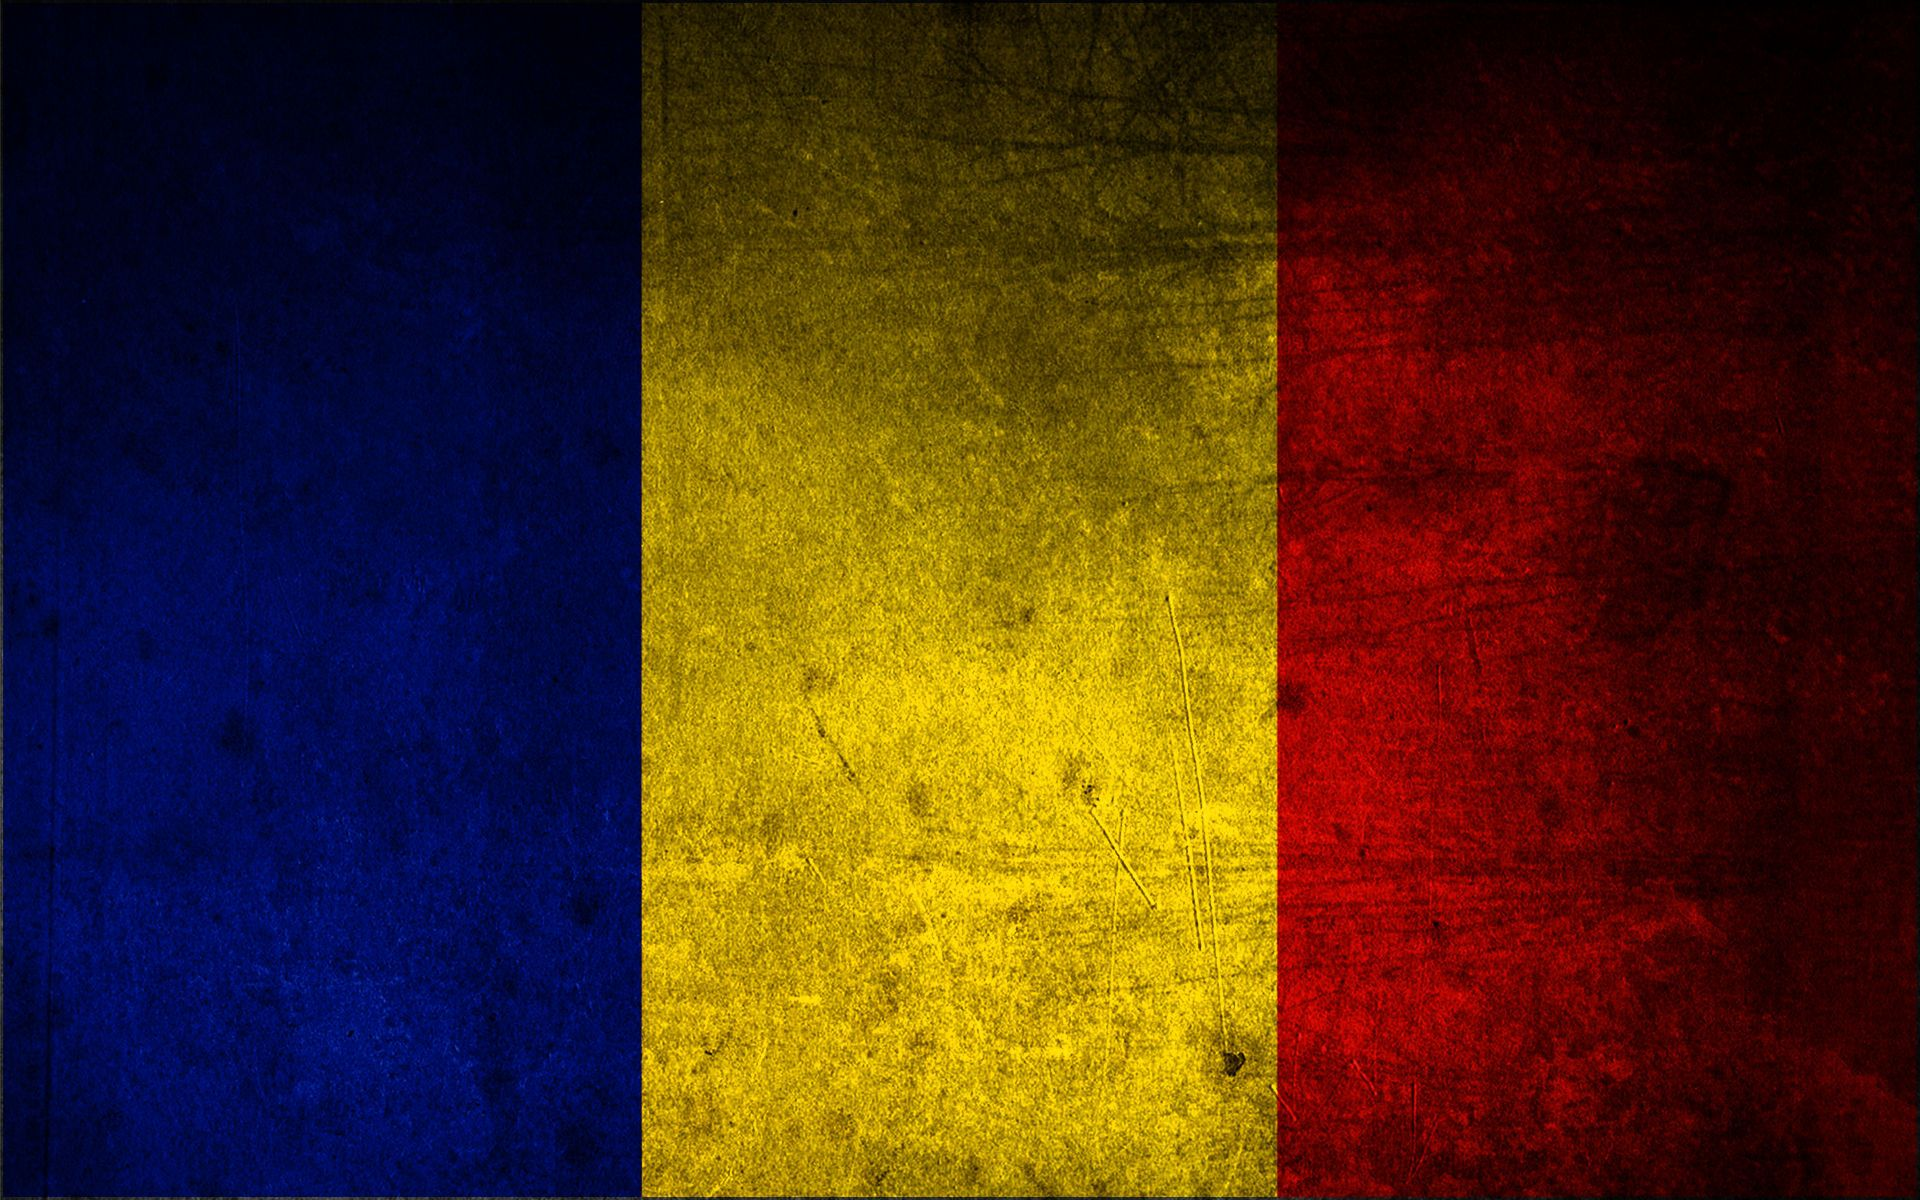 румыния флаг фото кстати, тоже было